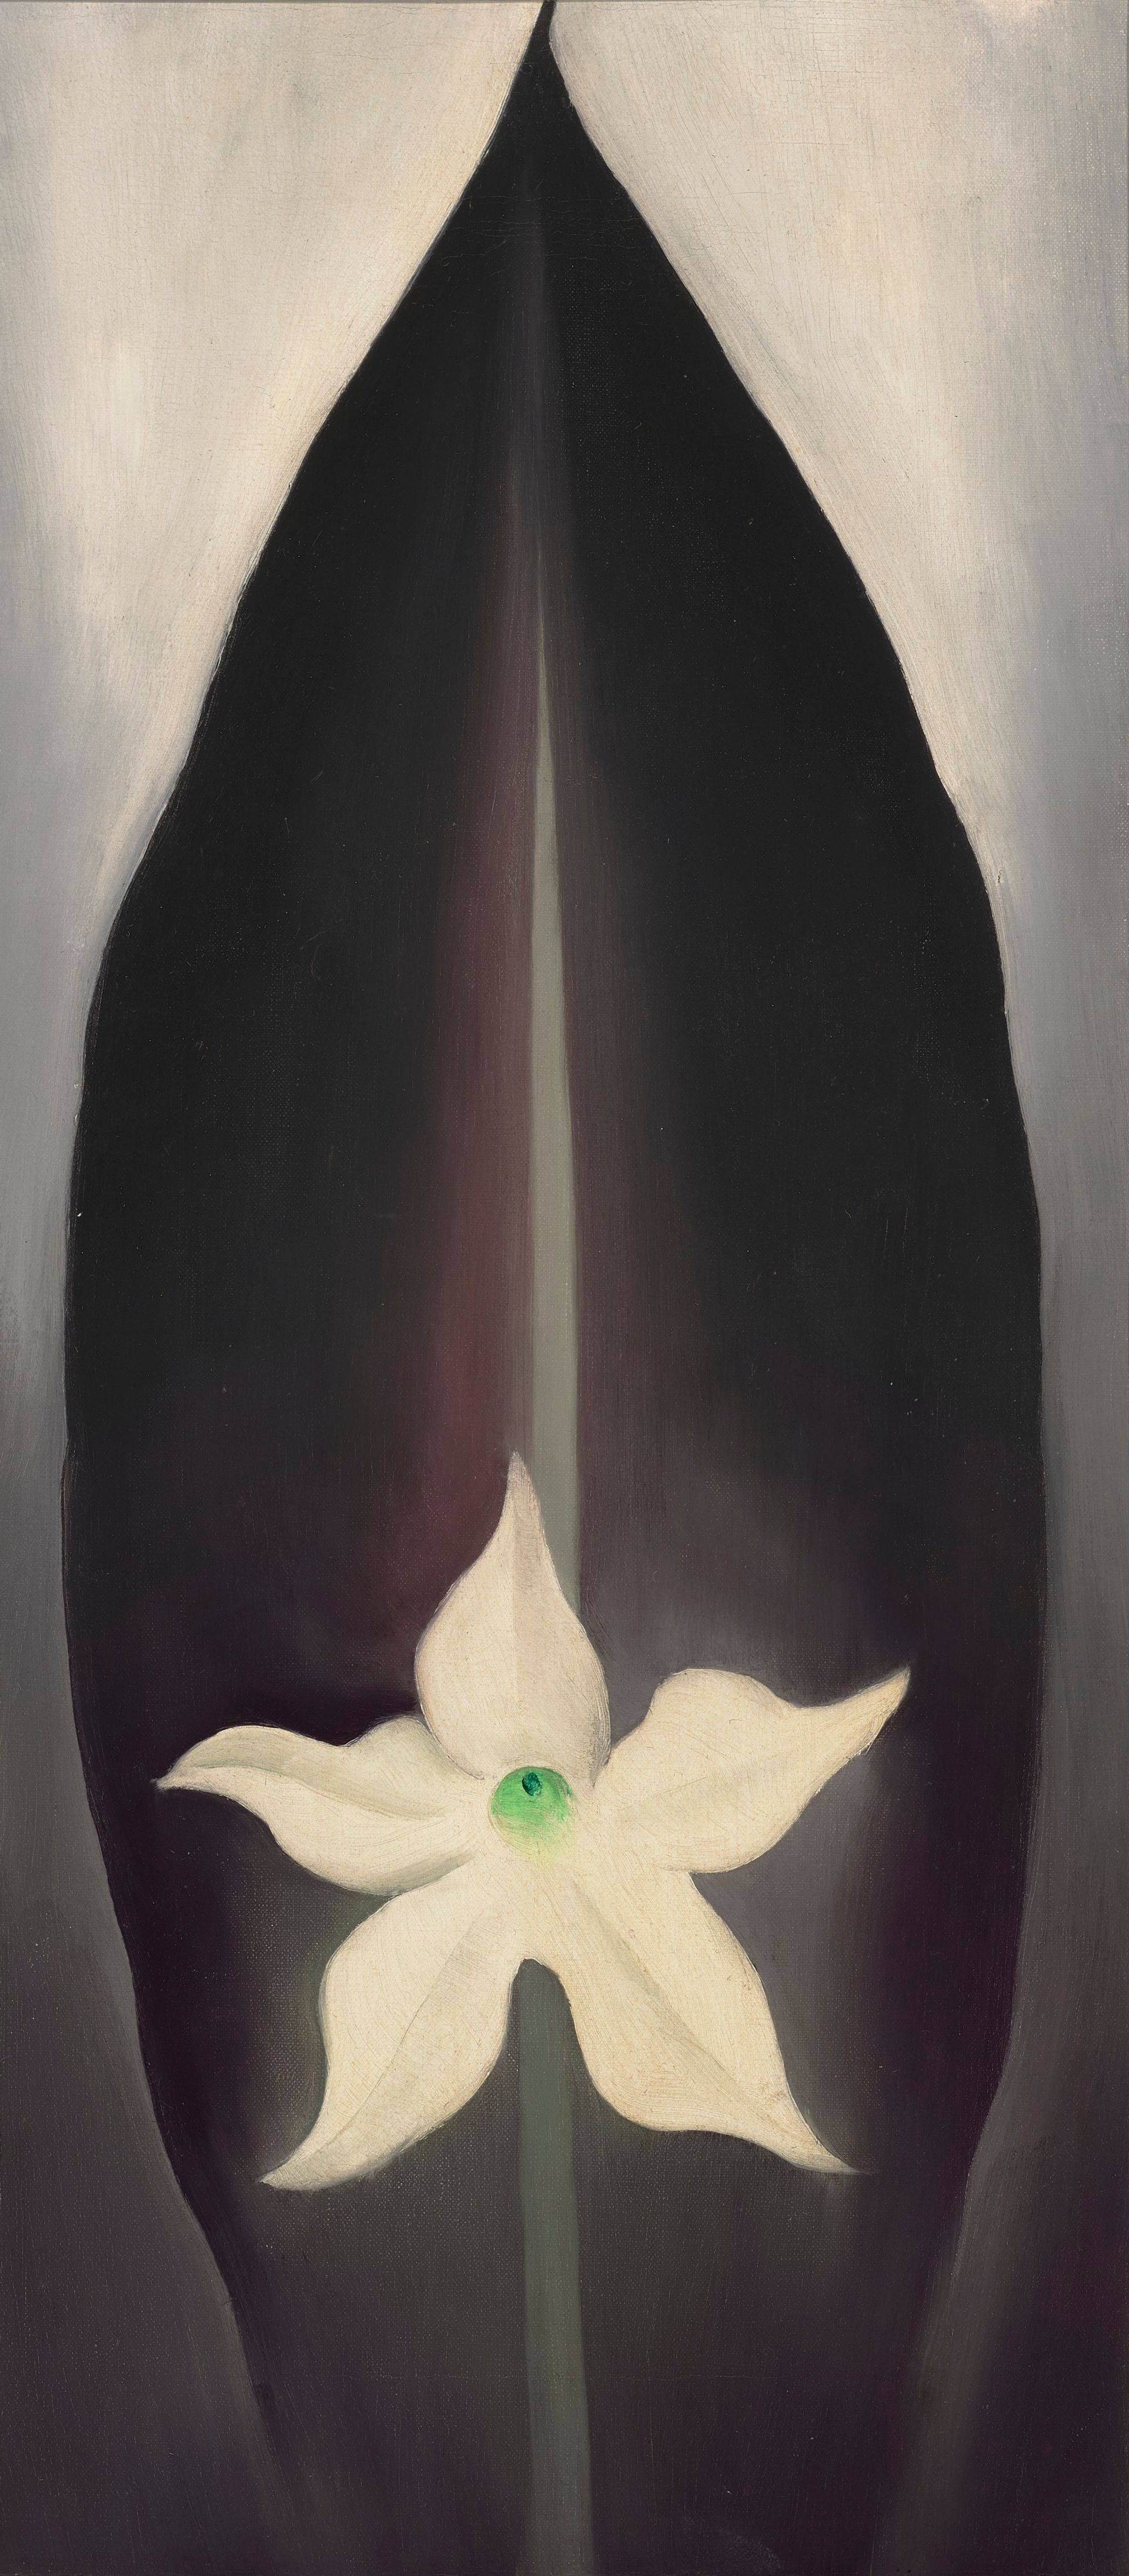 Georgia O'Keefe, Autumn Leaf and White Flower (1926) Courtesy: Christies